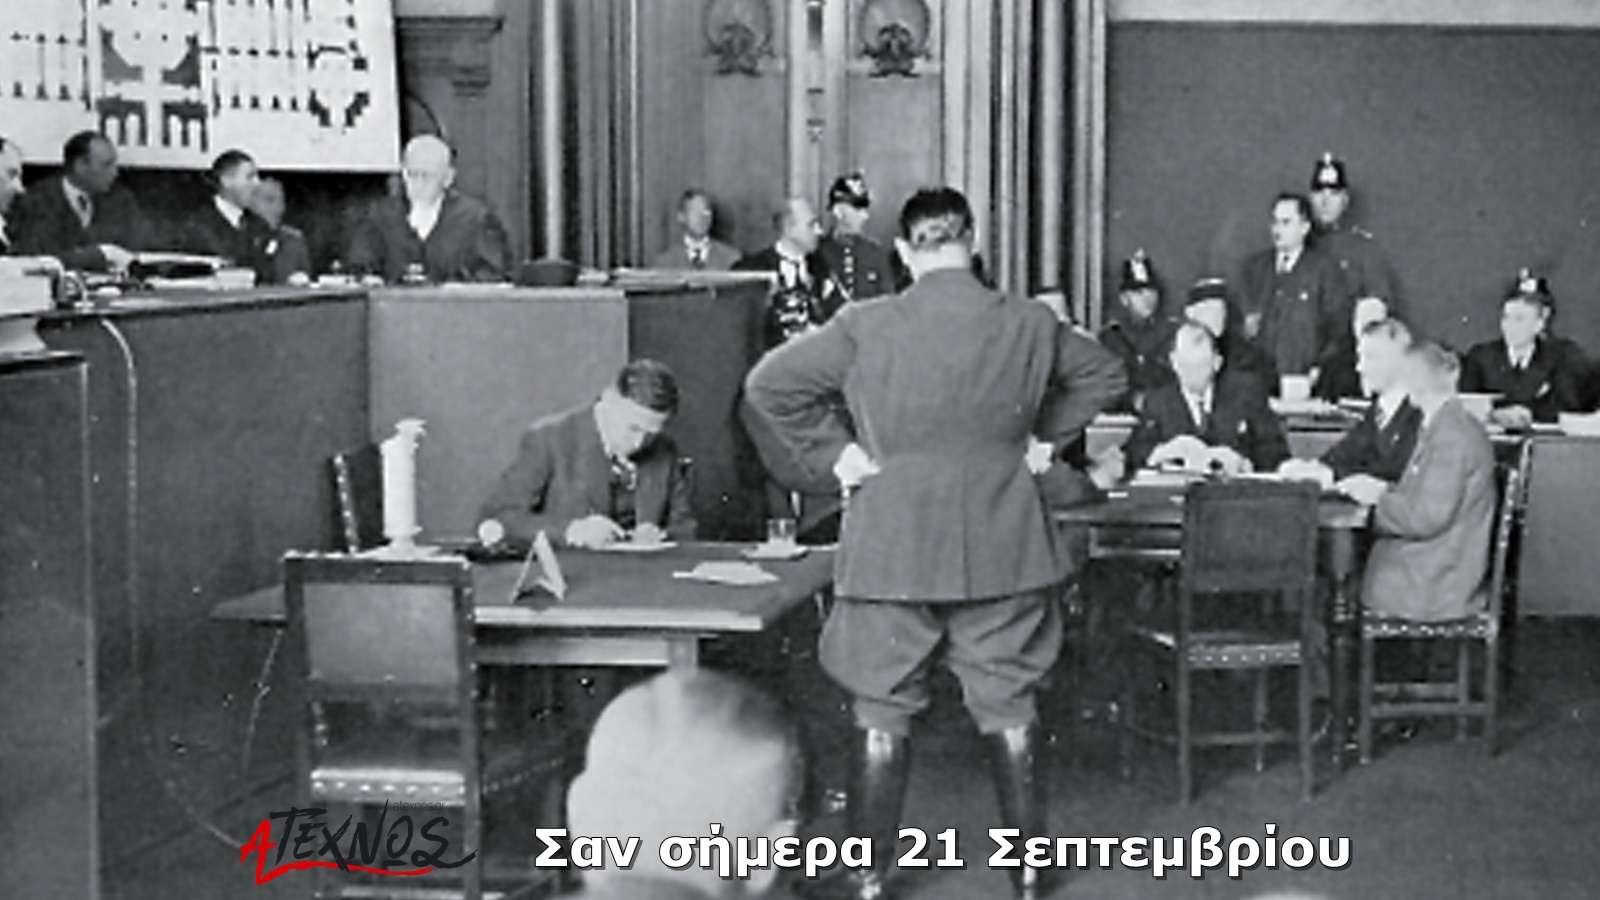 san simera 21 setembrioy